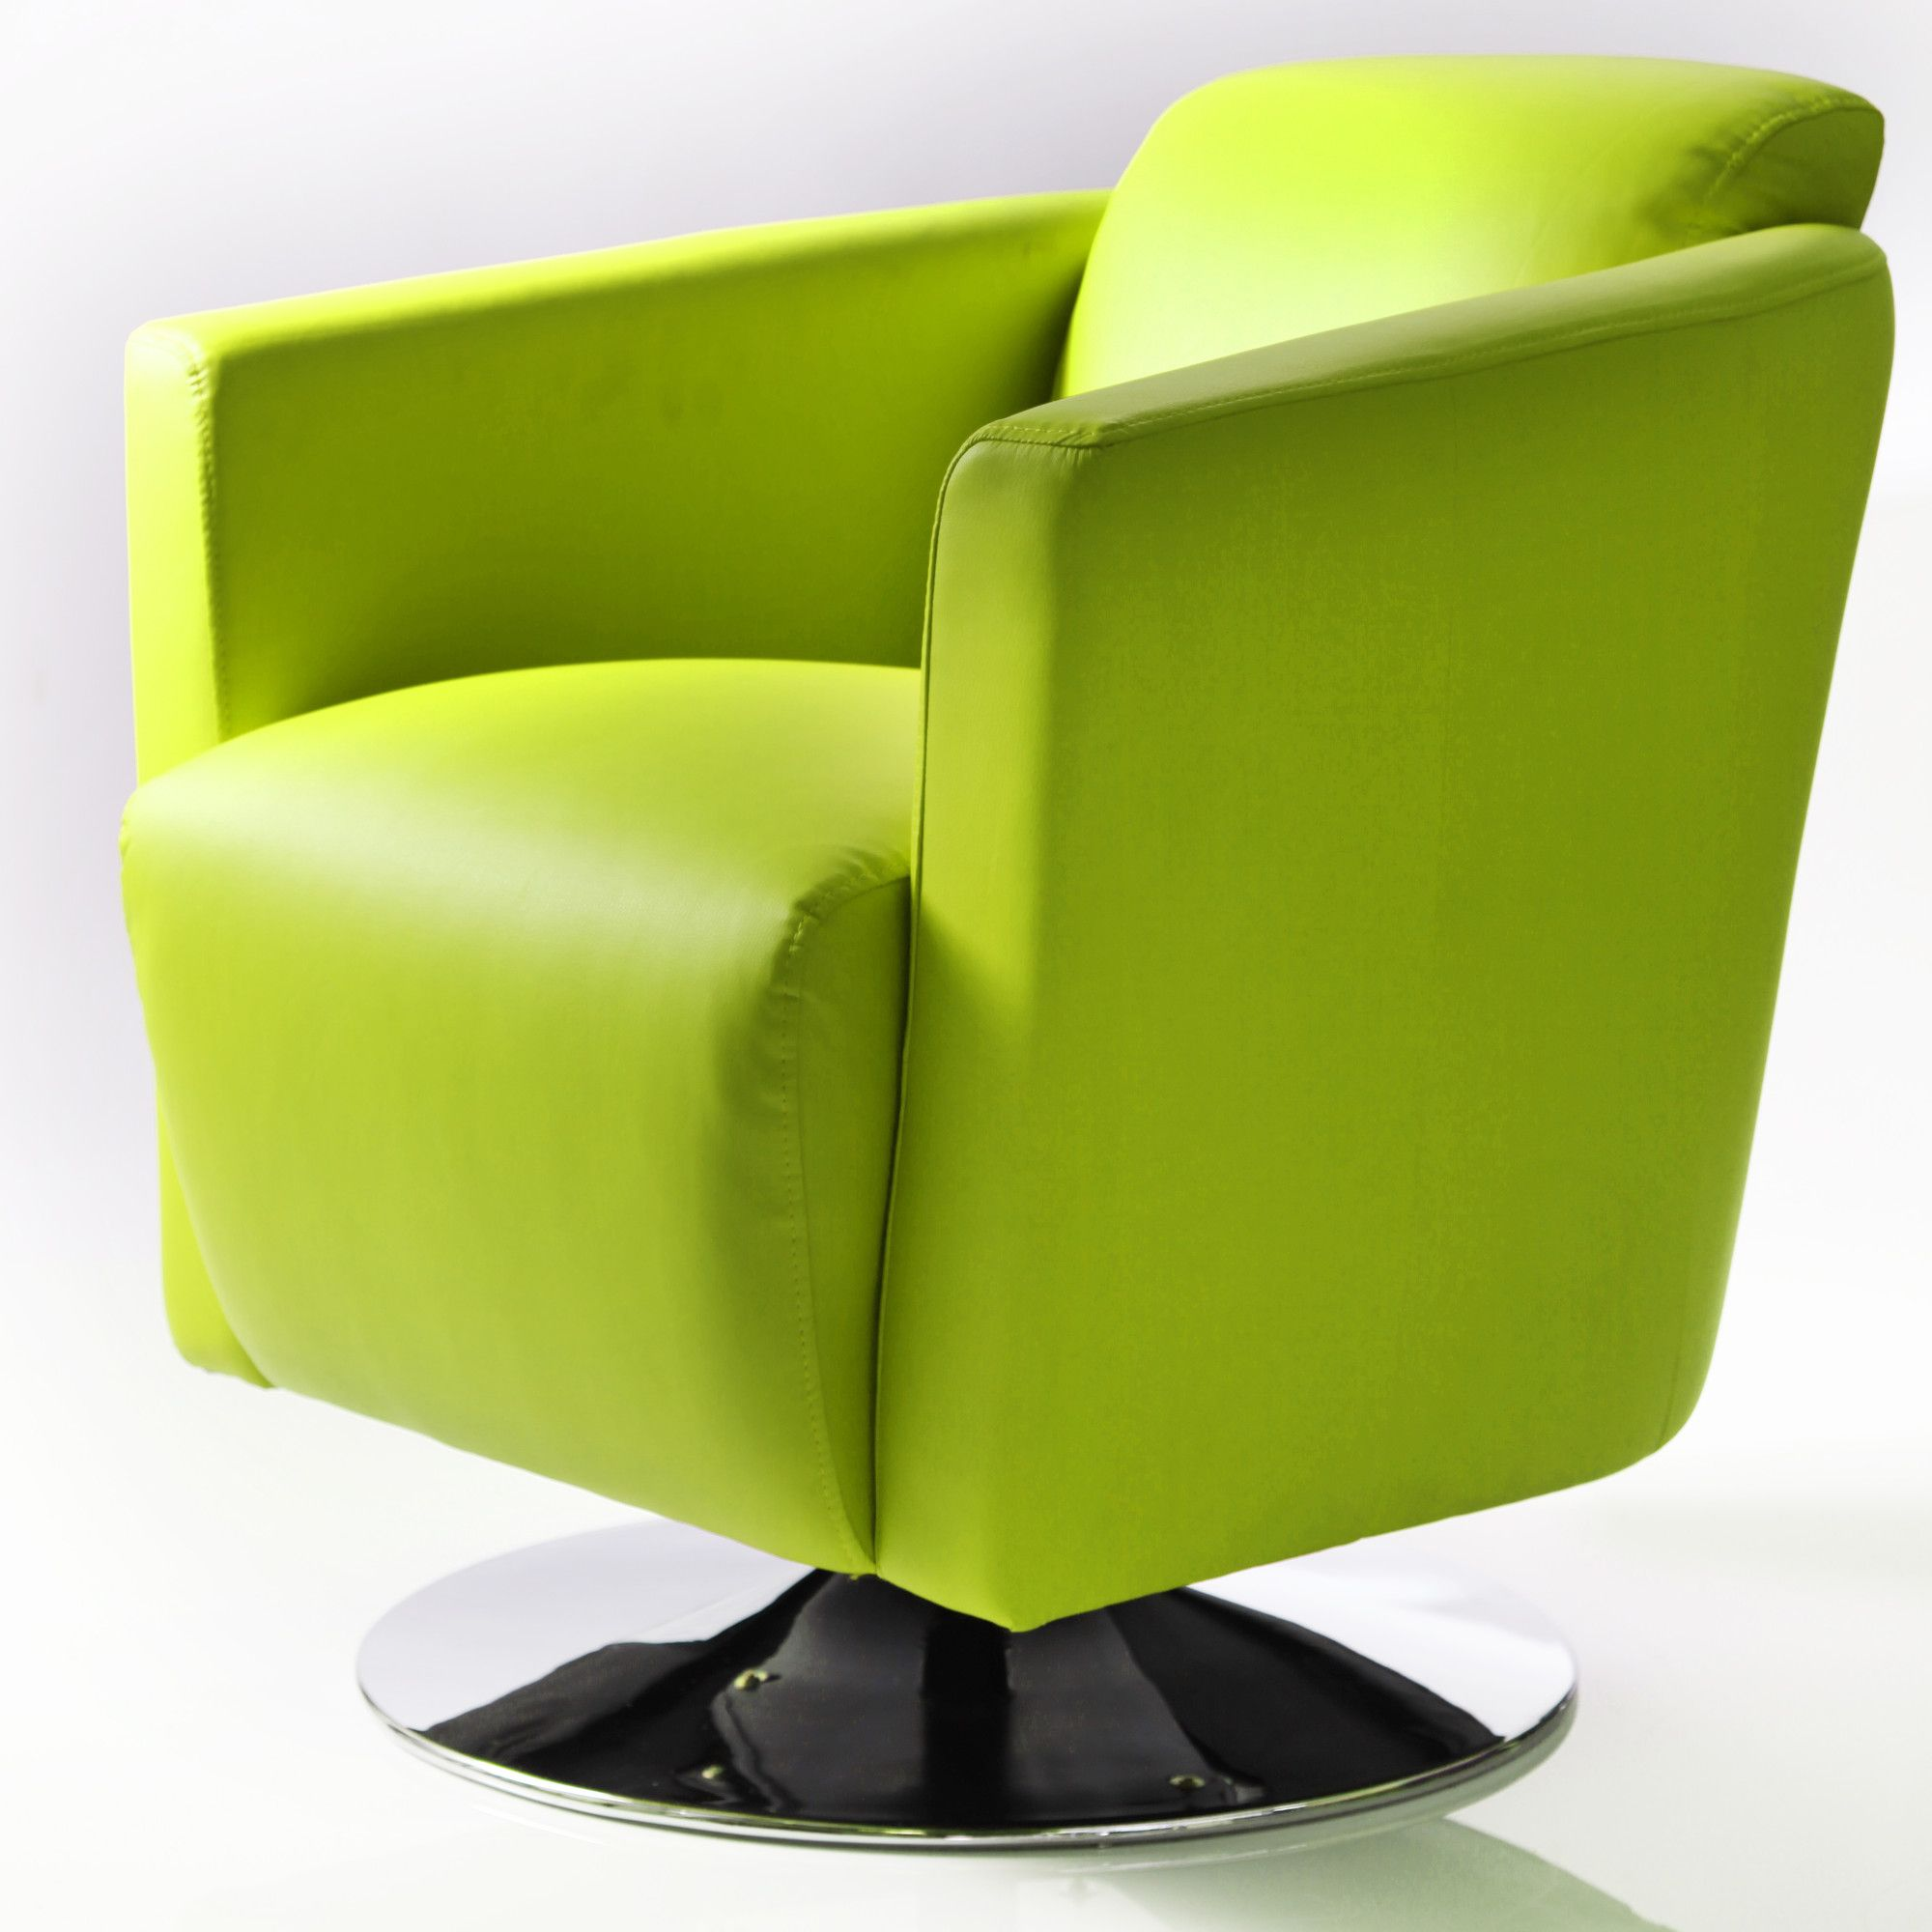 Wilkinson Furniture Pluto Swivel Tub chair - Purple at Tesco Direct